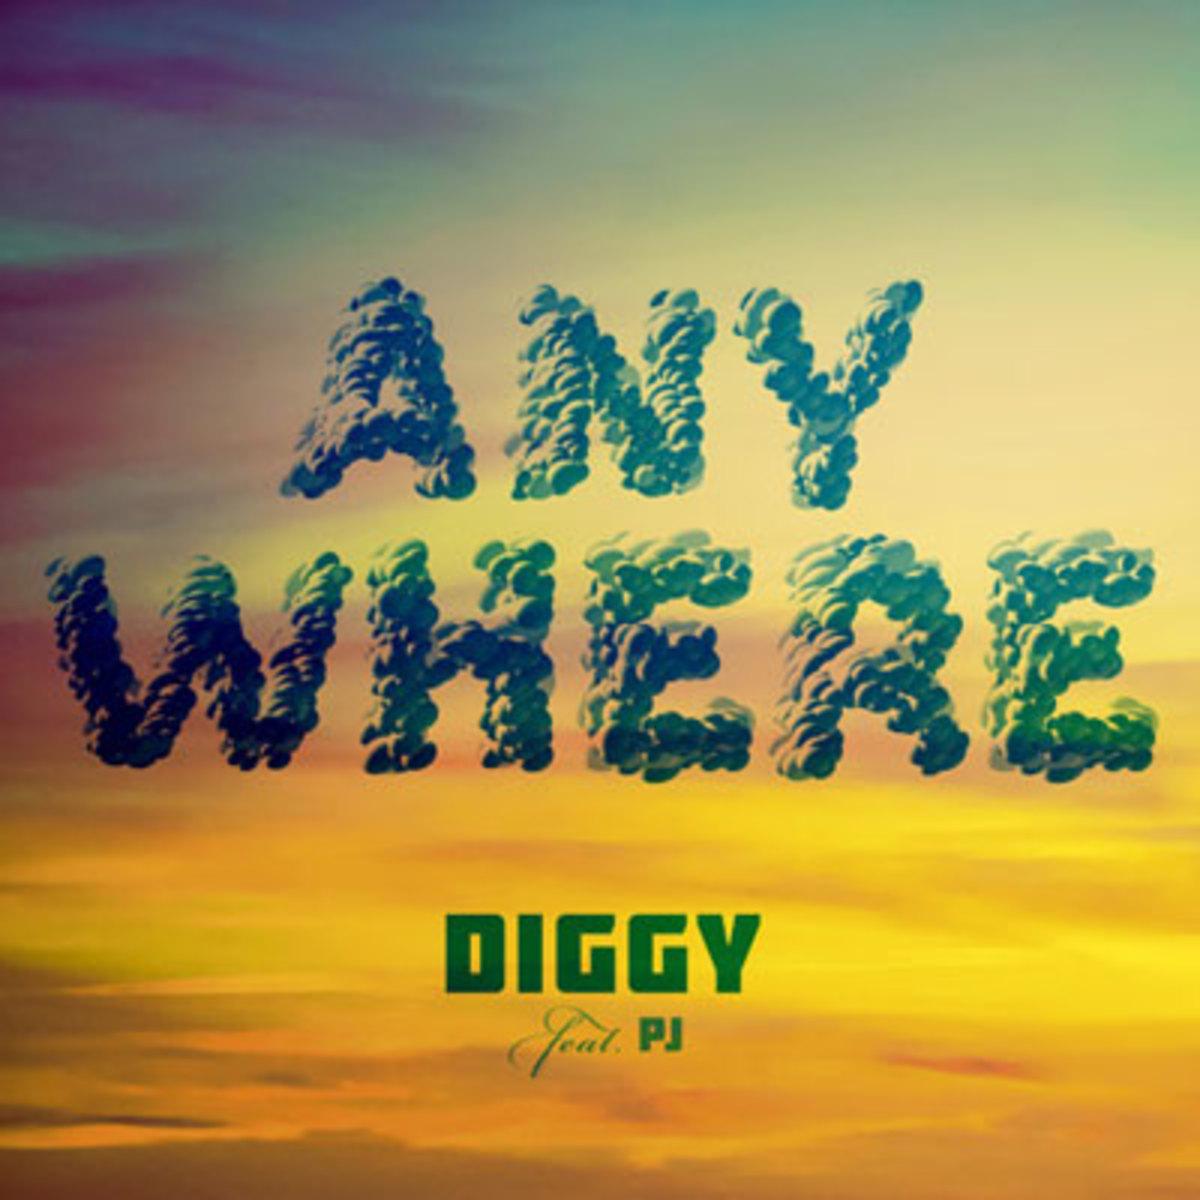 diggy-anywhere.jpg